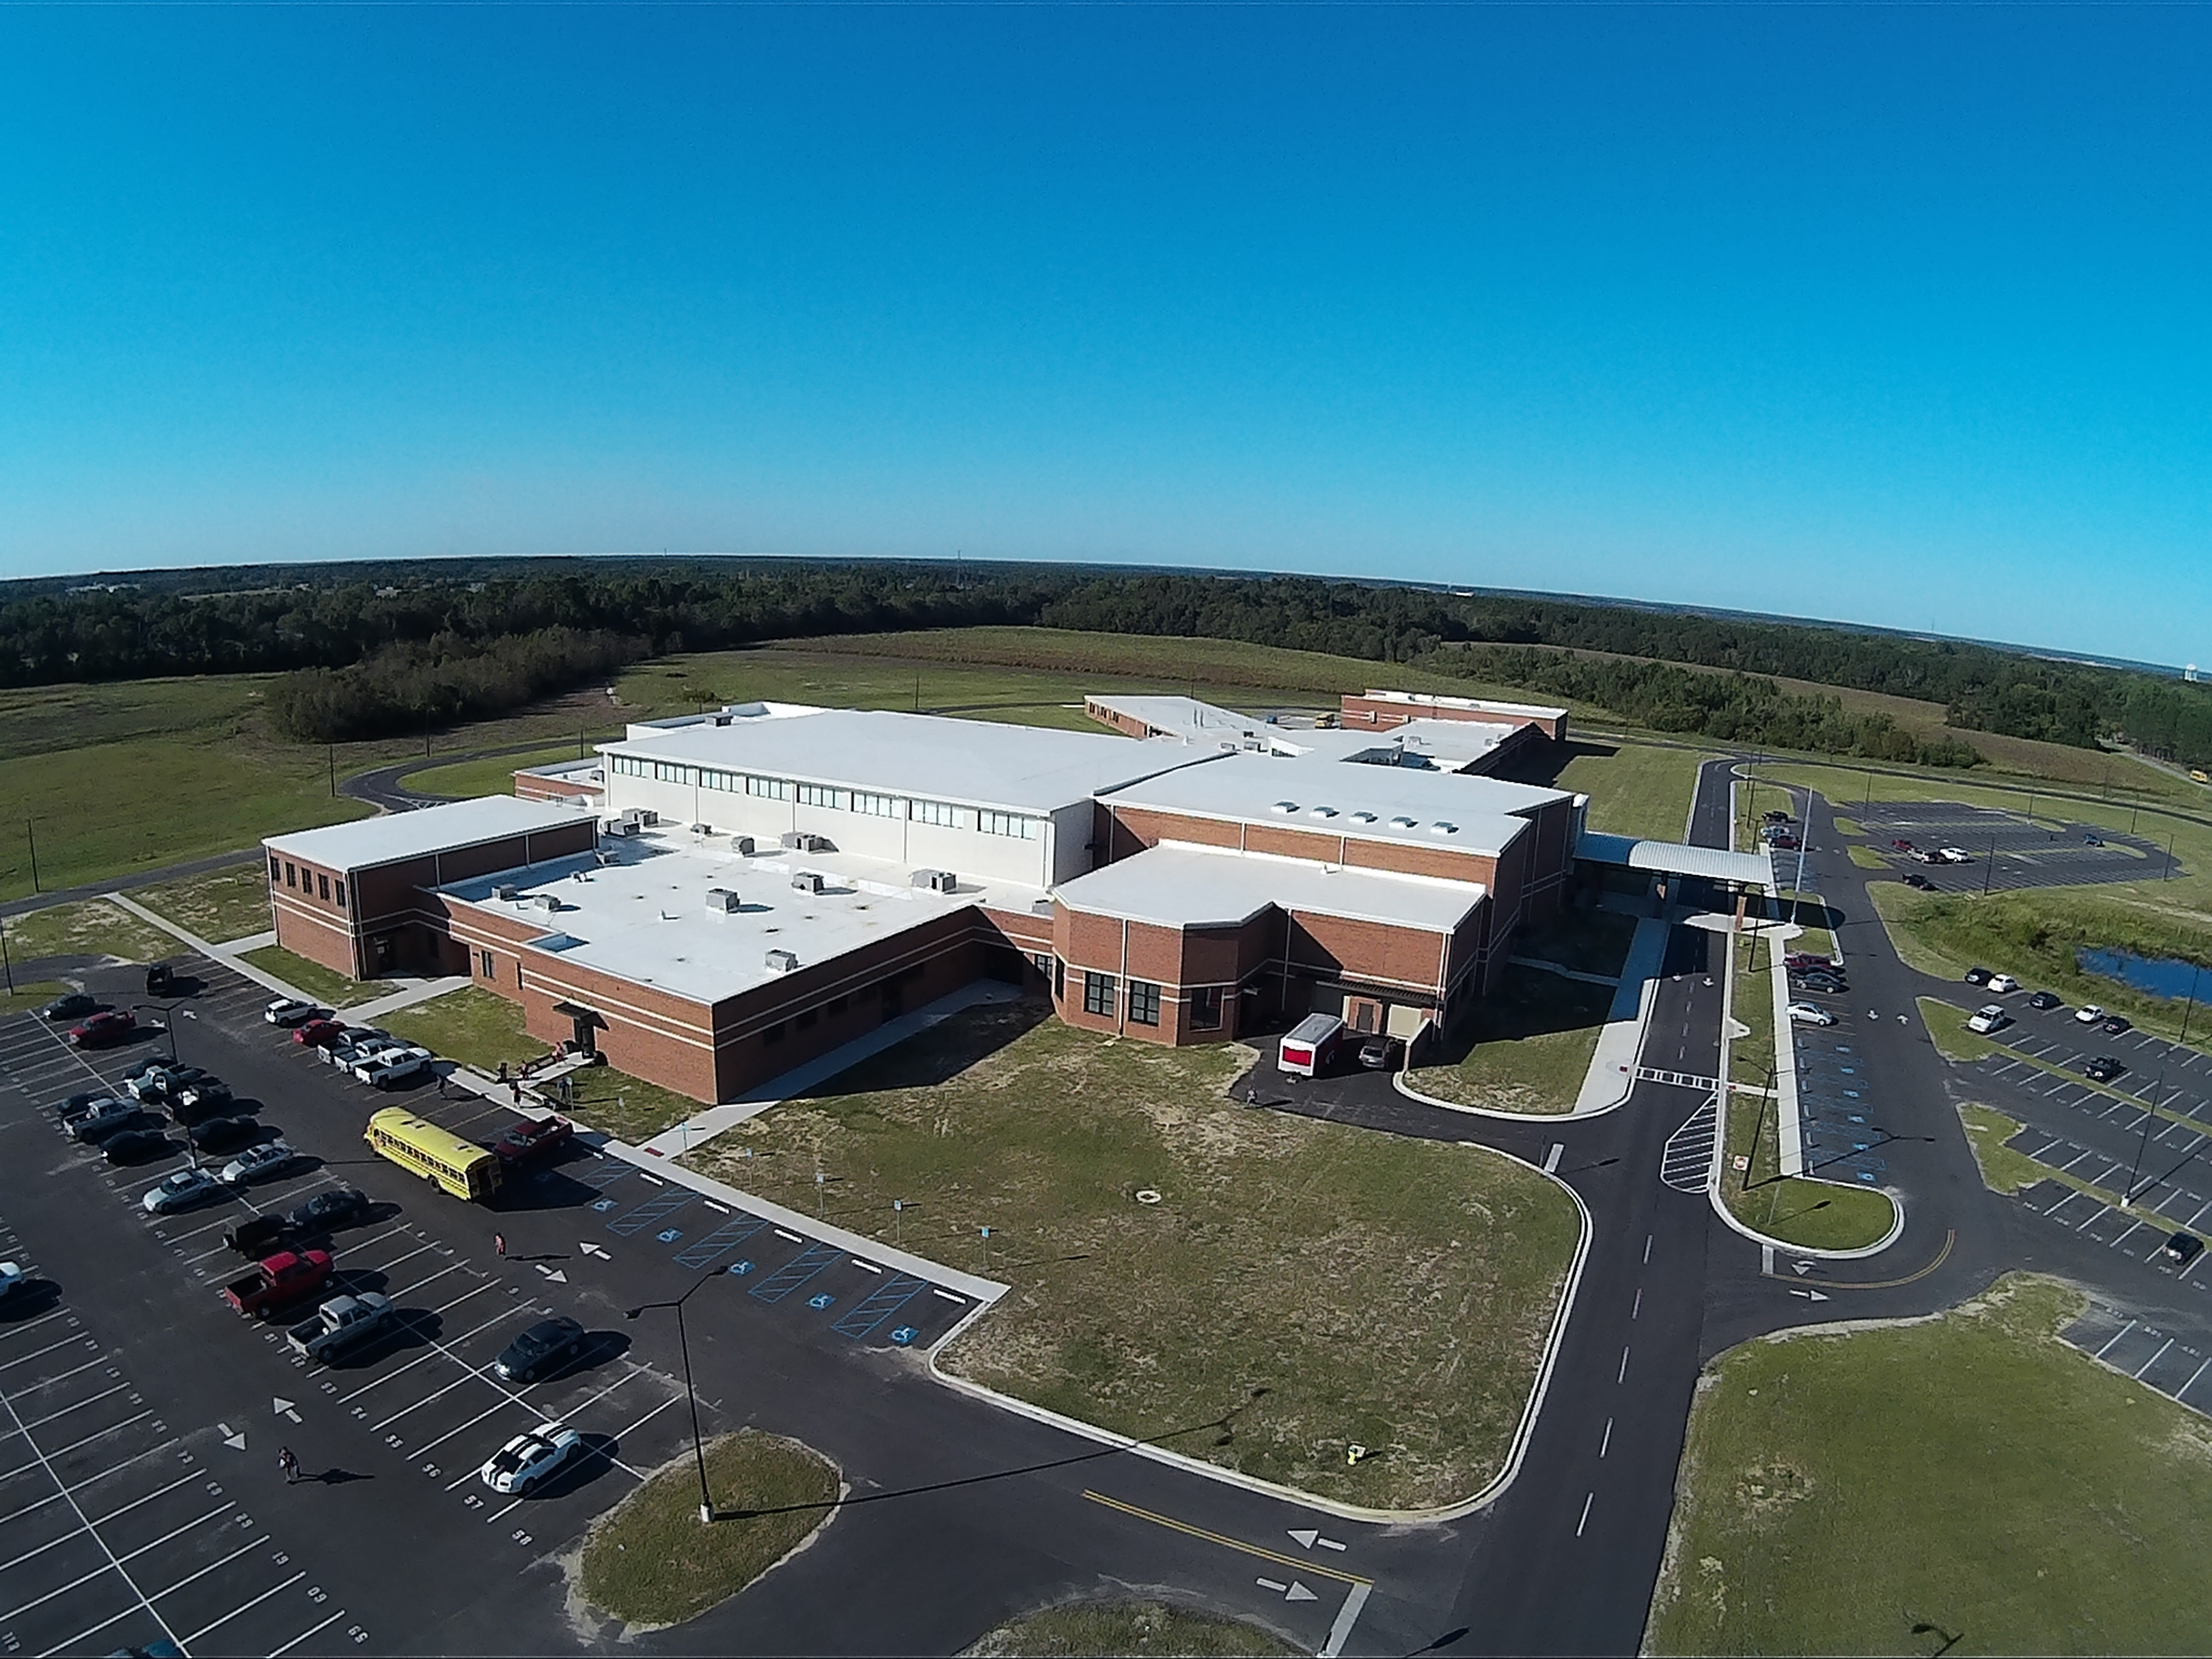 Toombs County High School